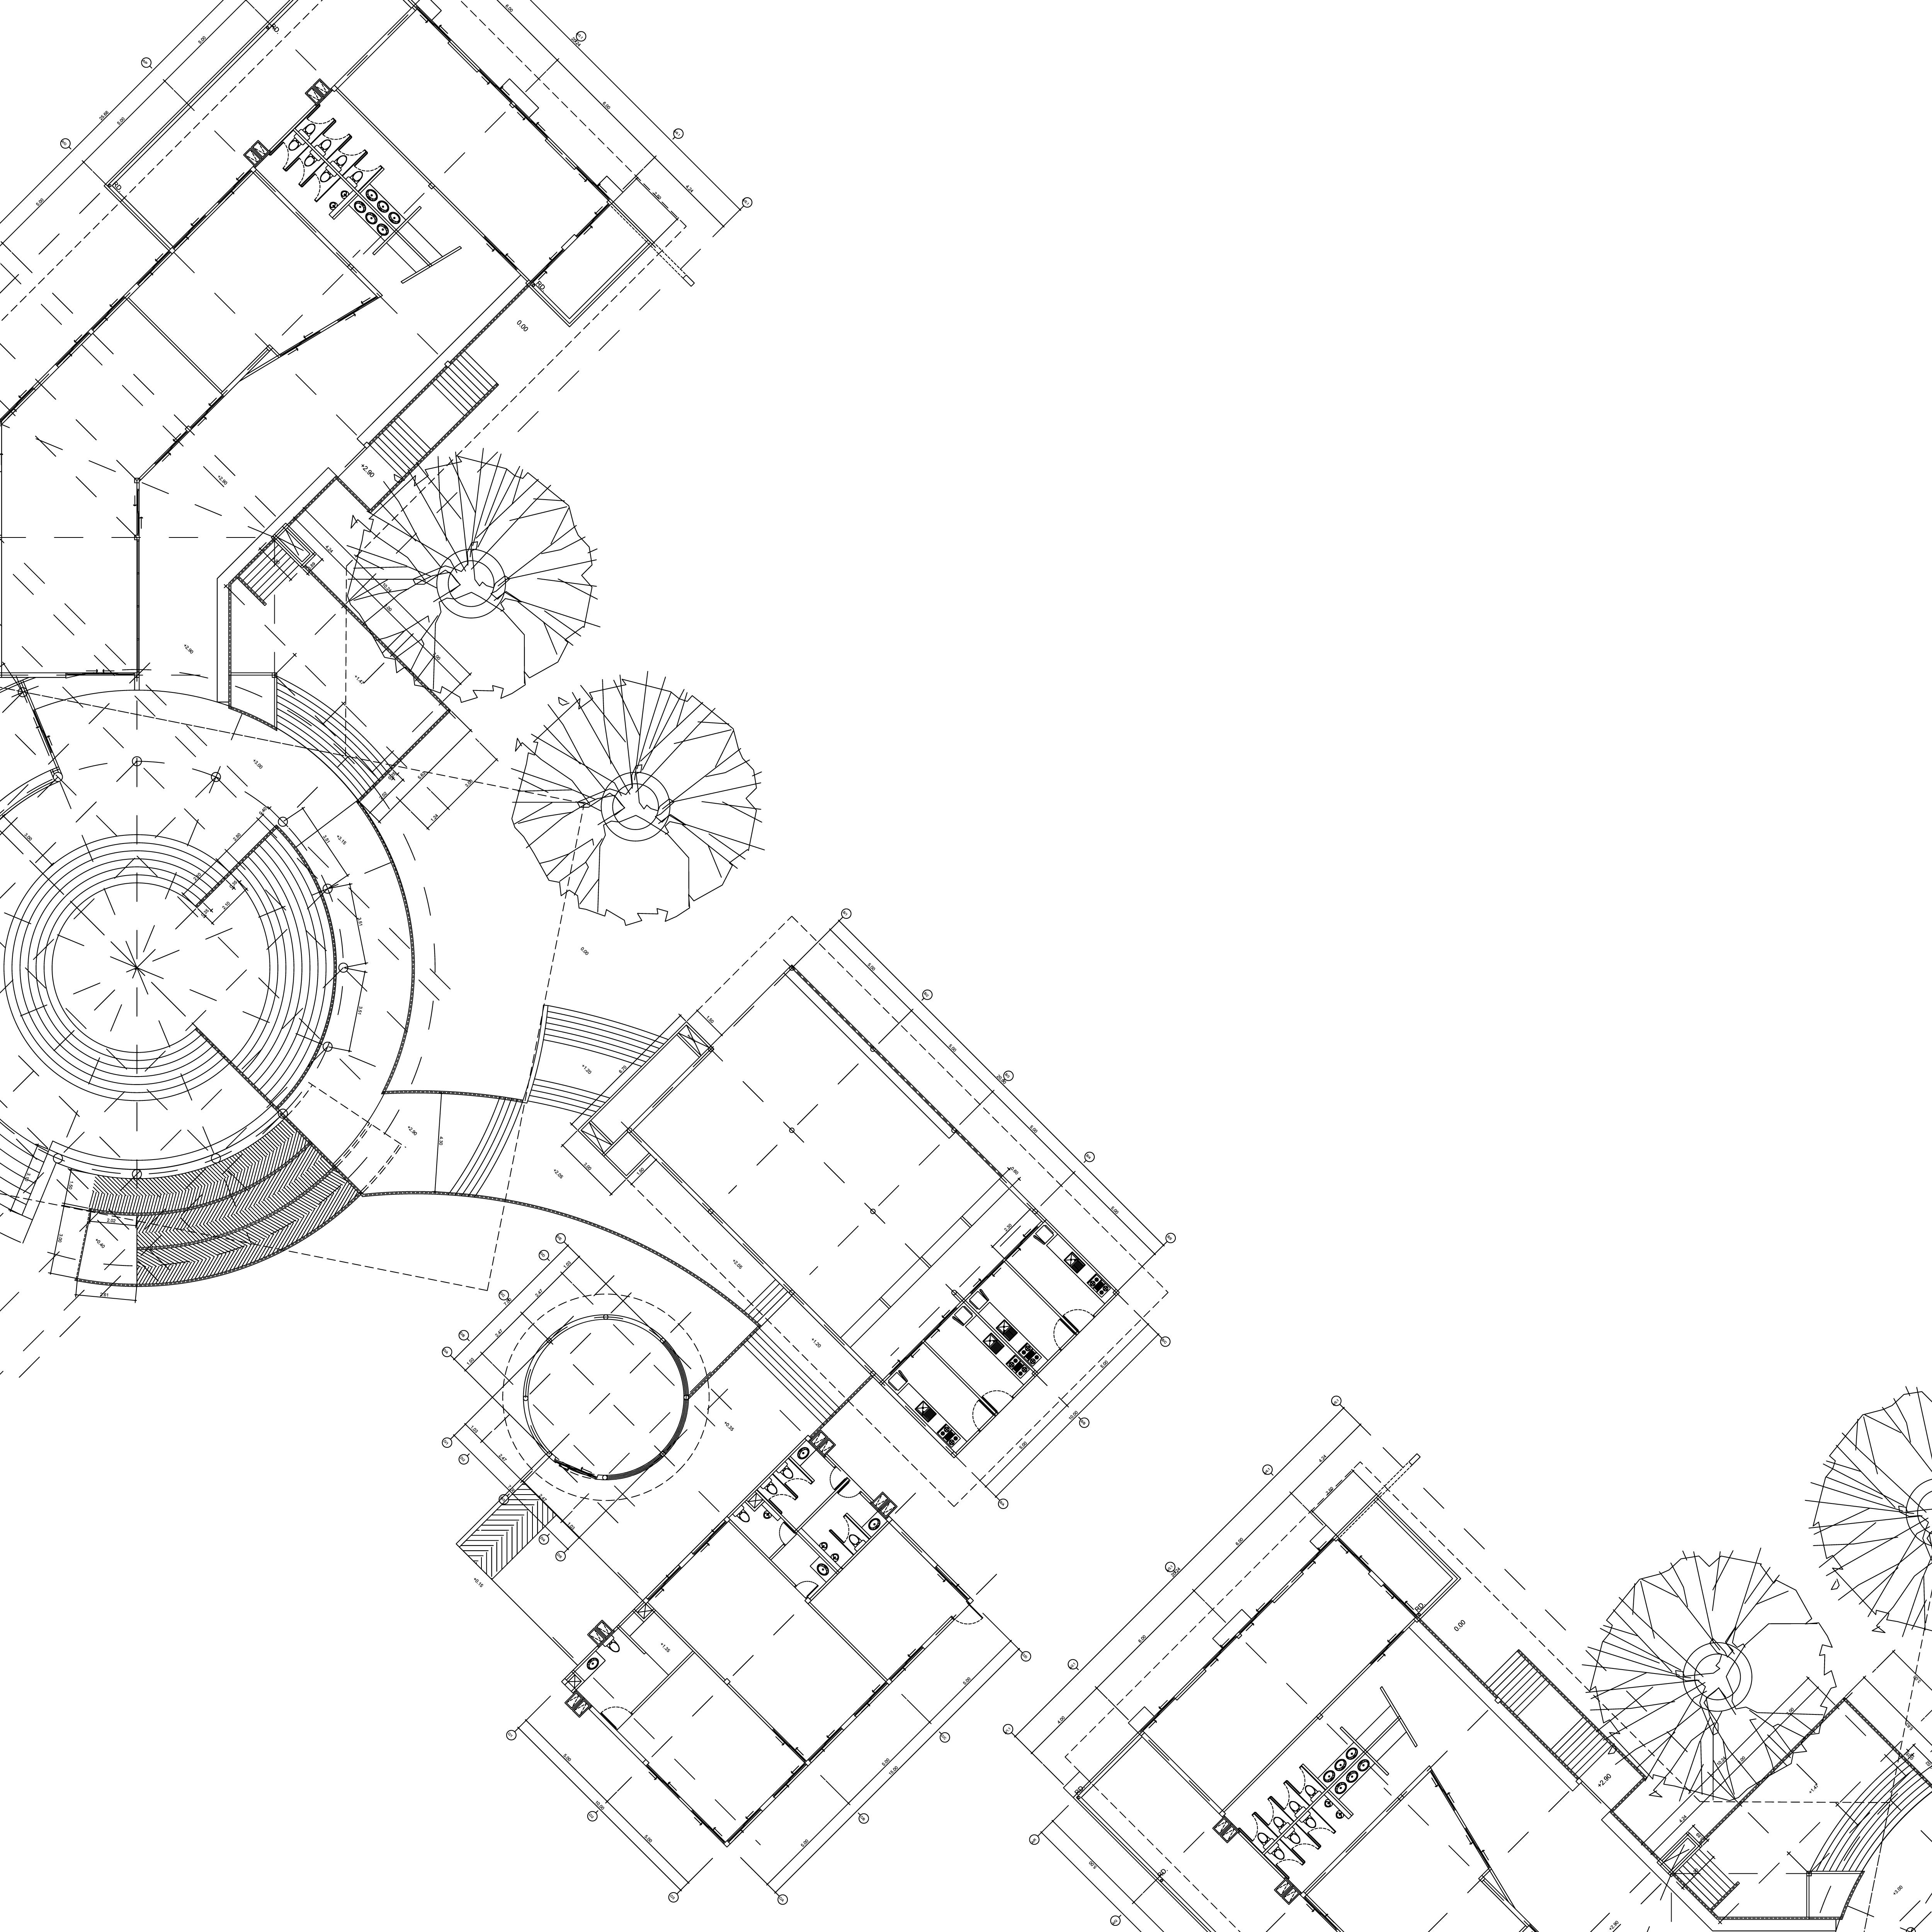 minimalist architectural design white background creative